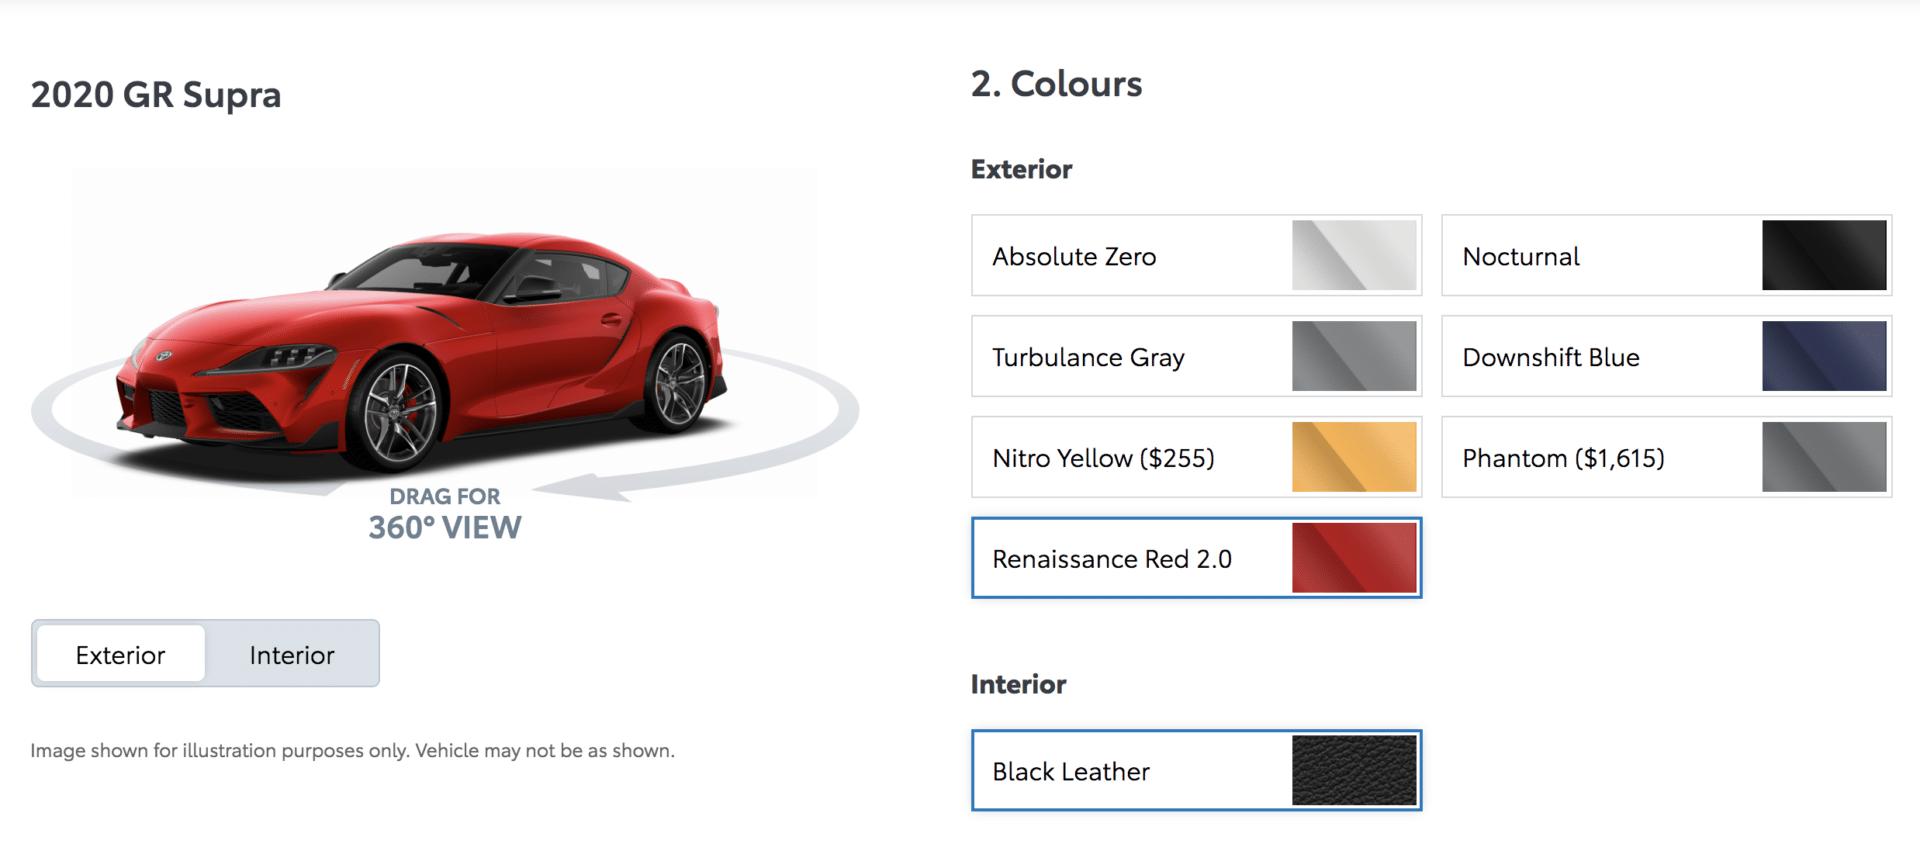 2020 Toyota Supra color summary